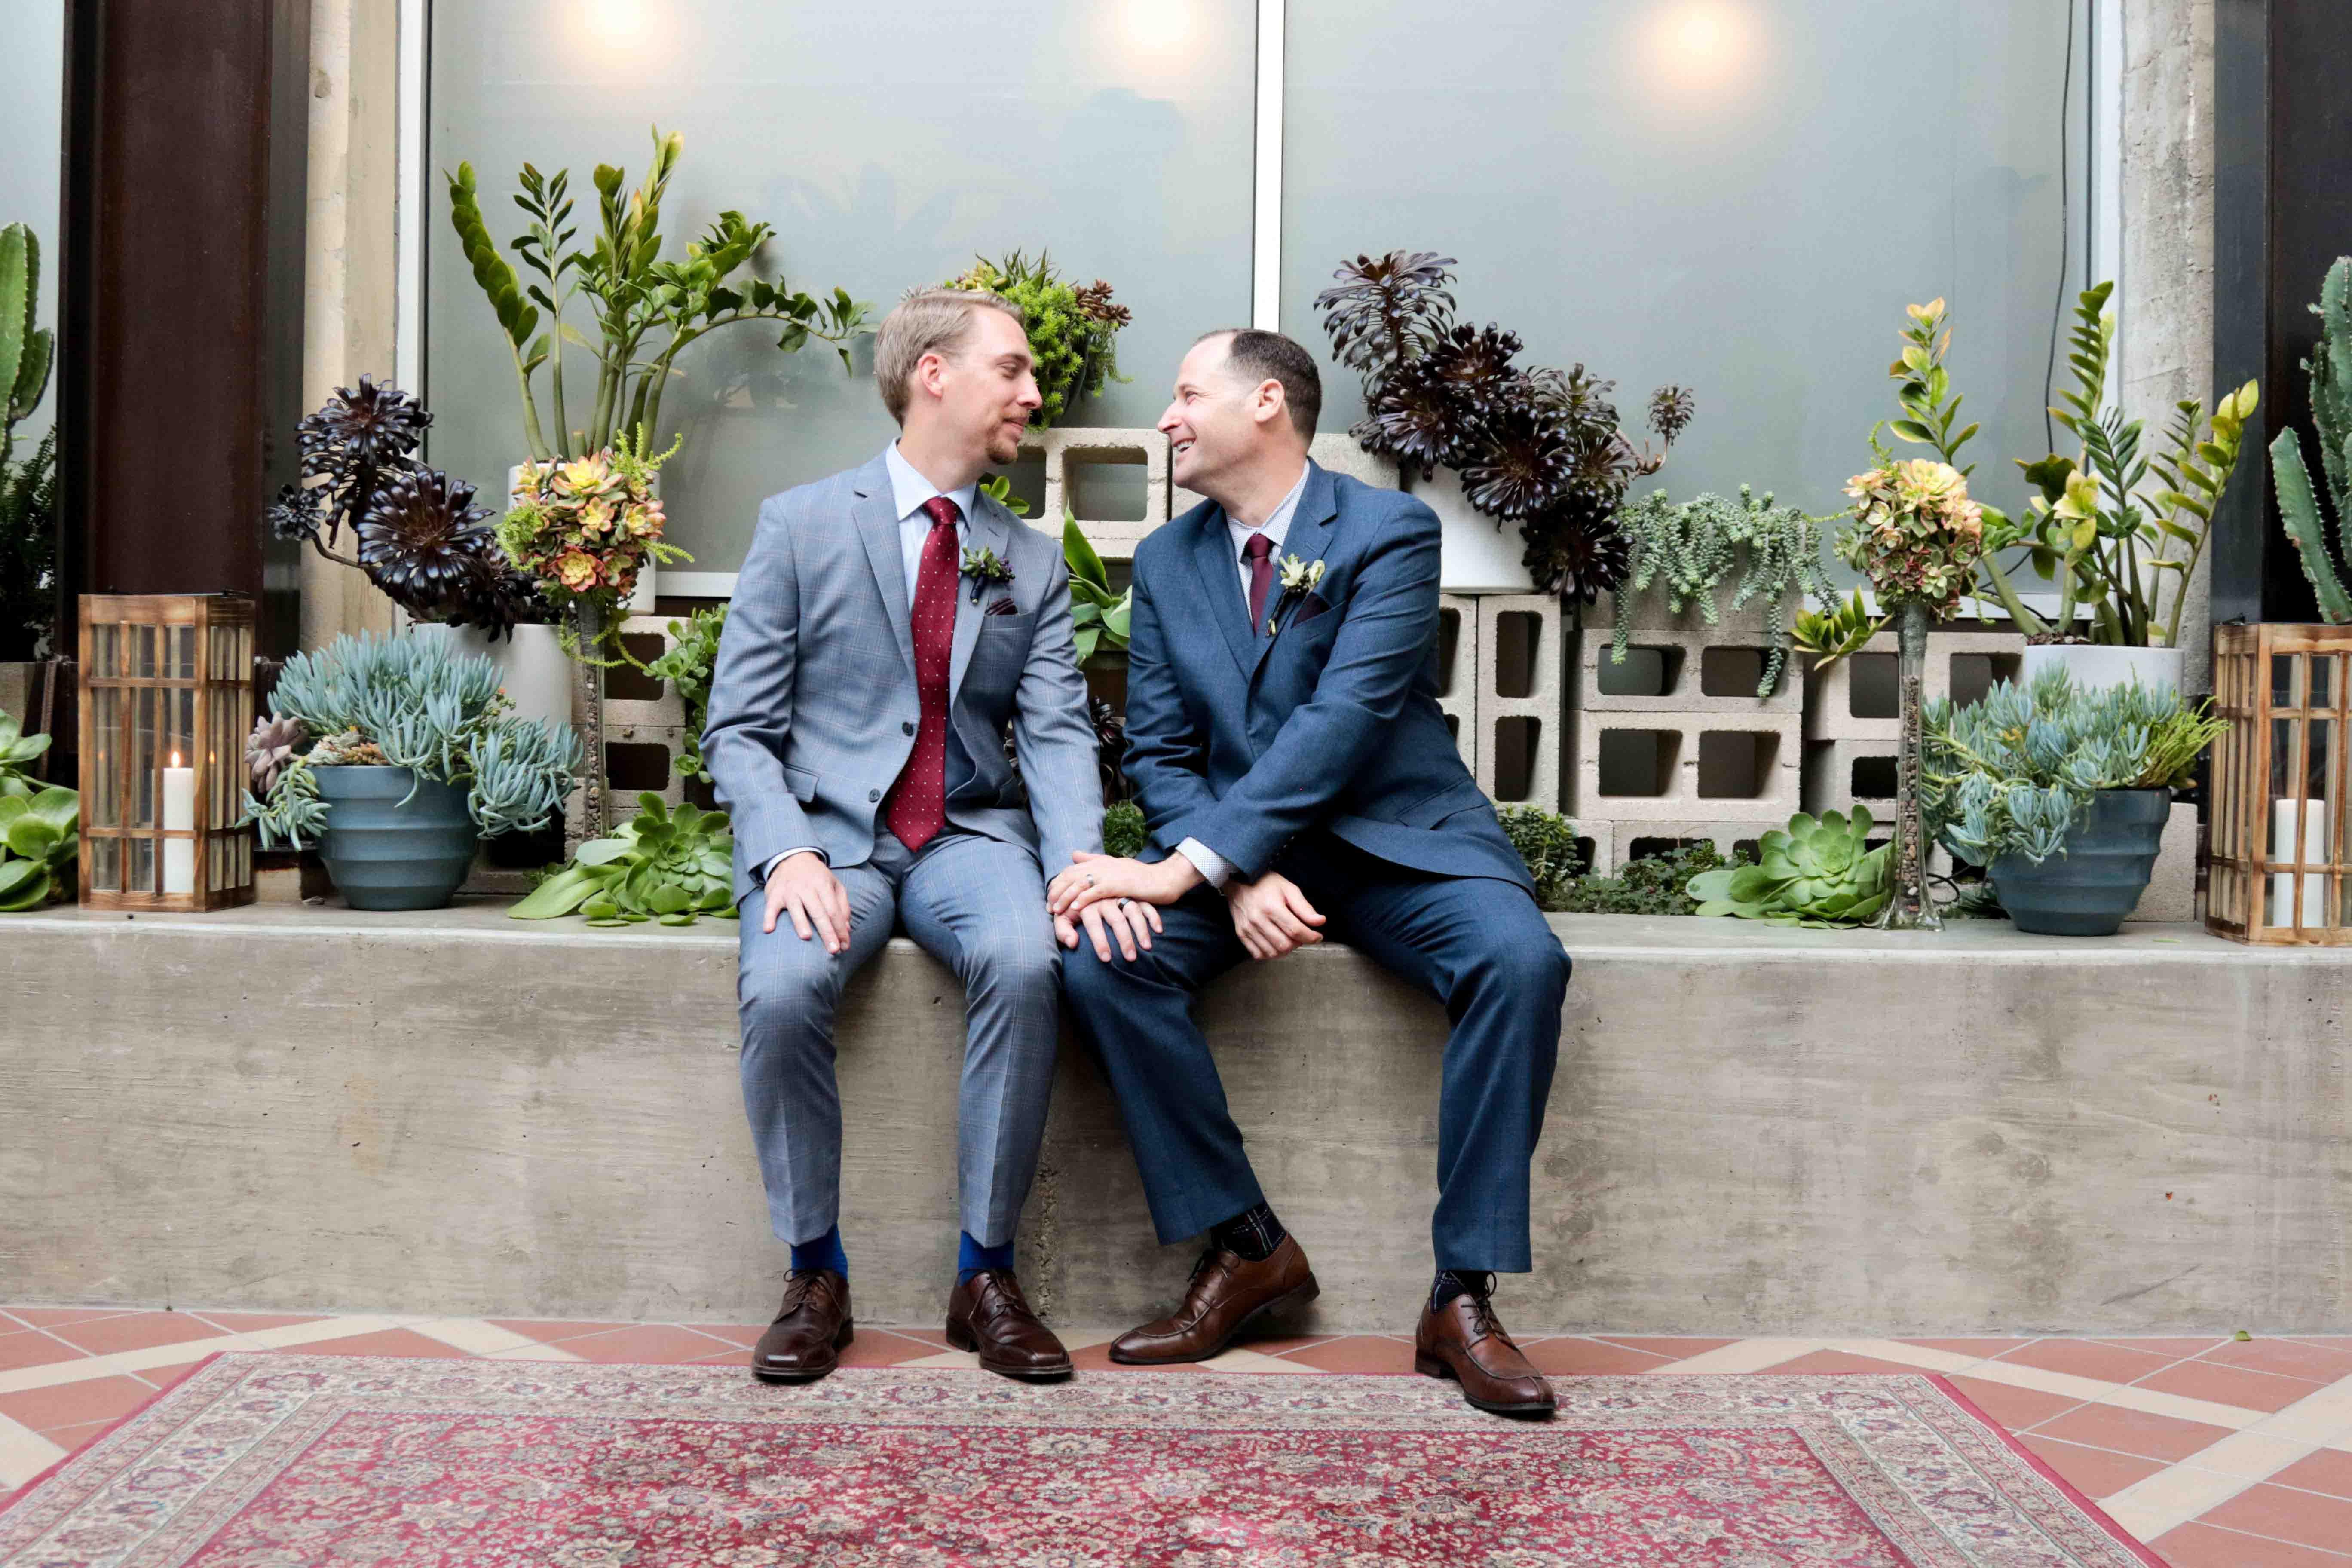 The Howl Wedding, Gay Los Angeles Wedding, LGBT Wedding Photography